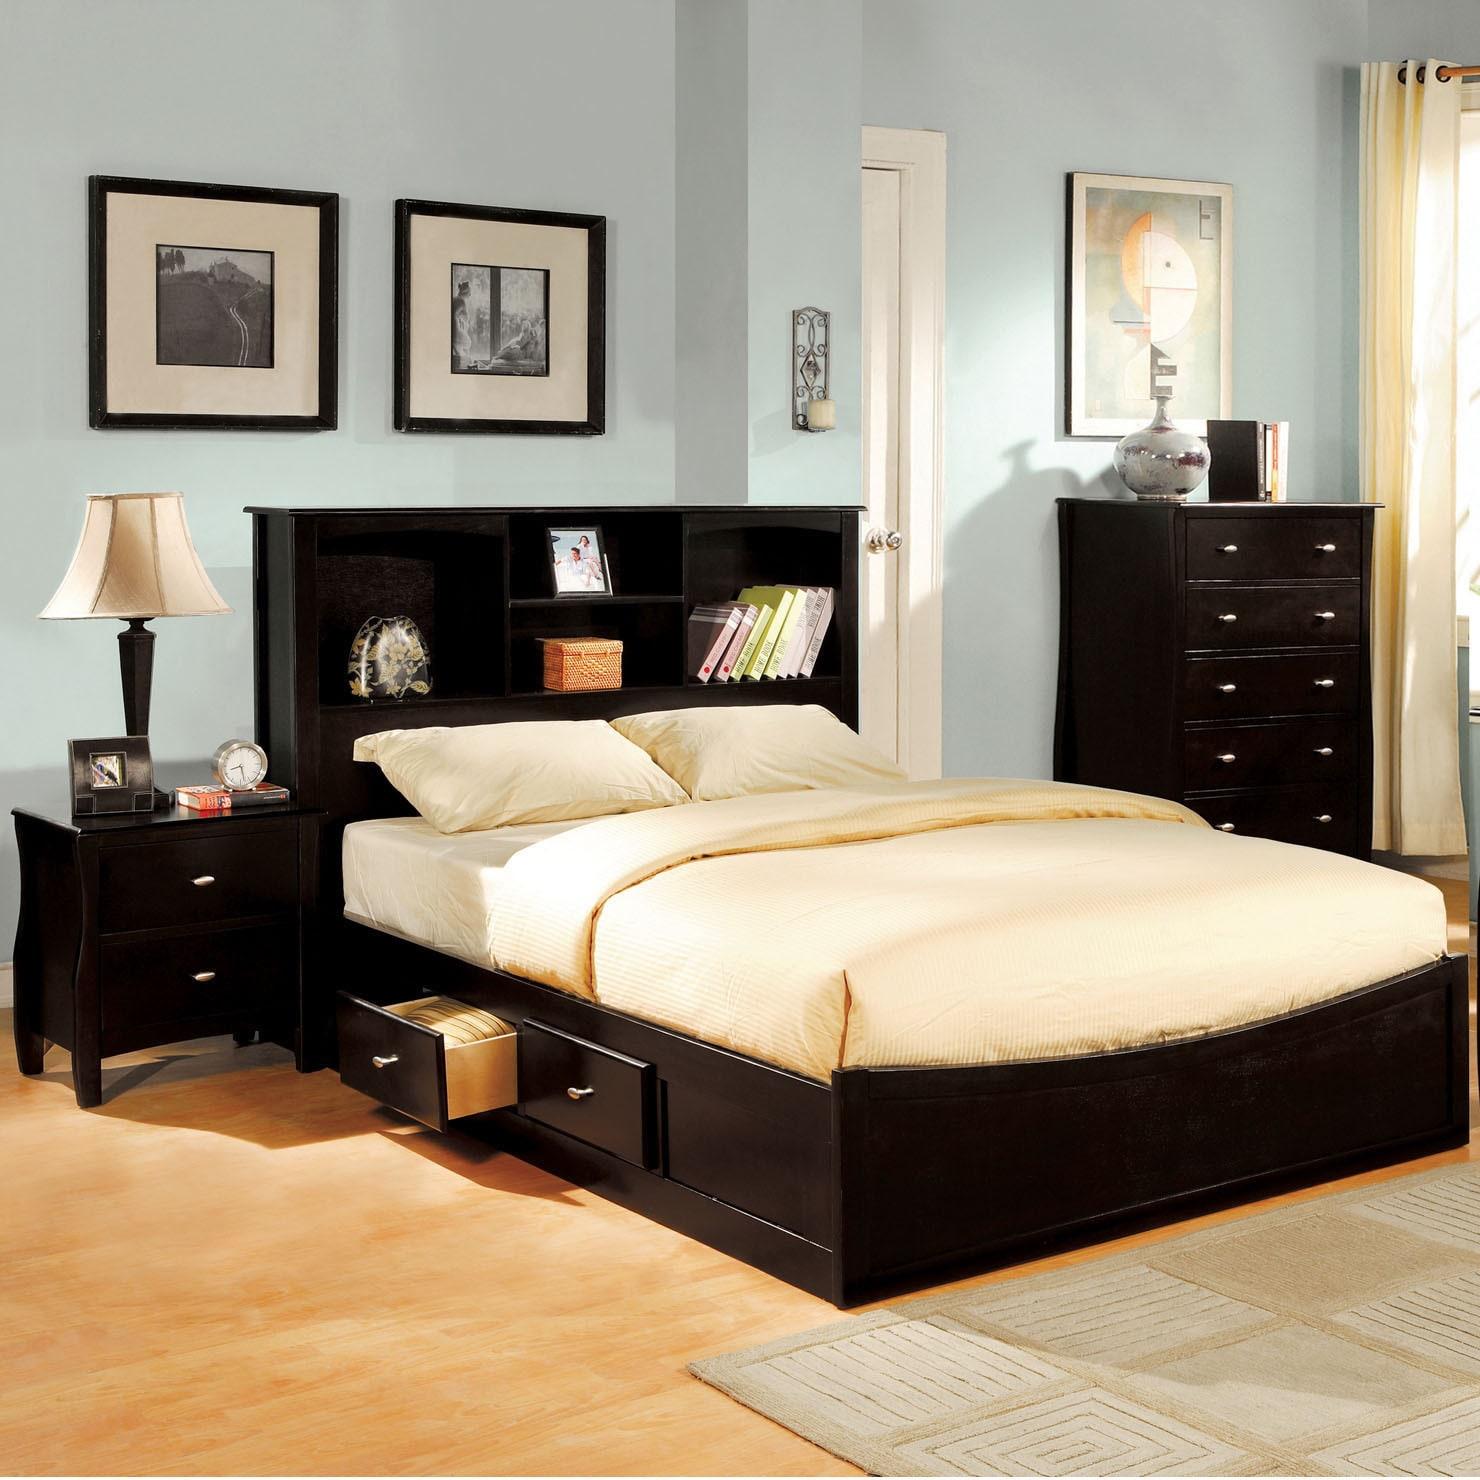 Furniture of America Elisandre Espresso Bookcase Headboar...